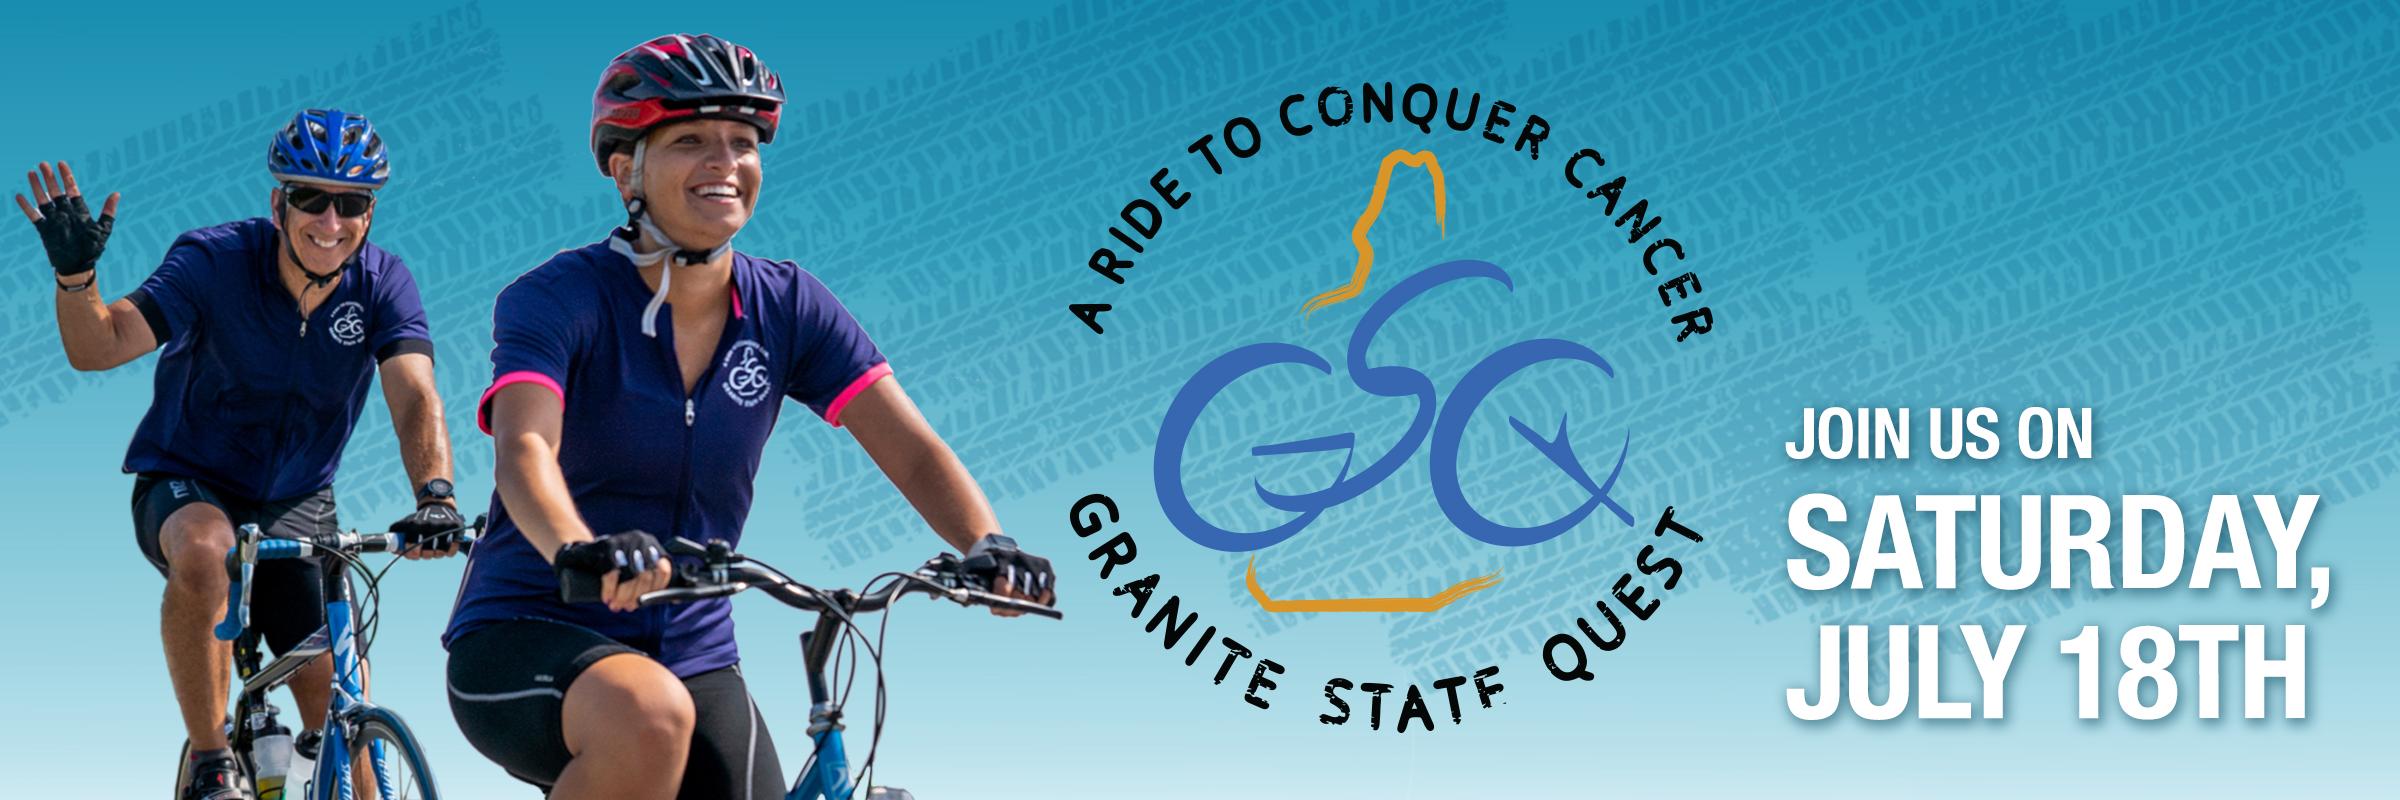 Granite State Quest 2020